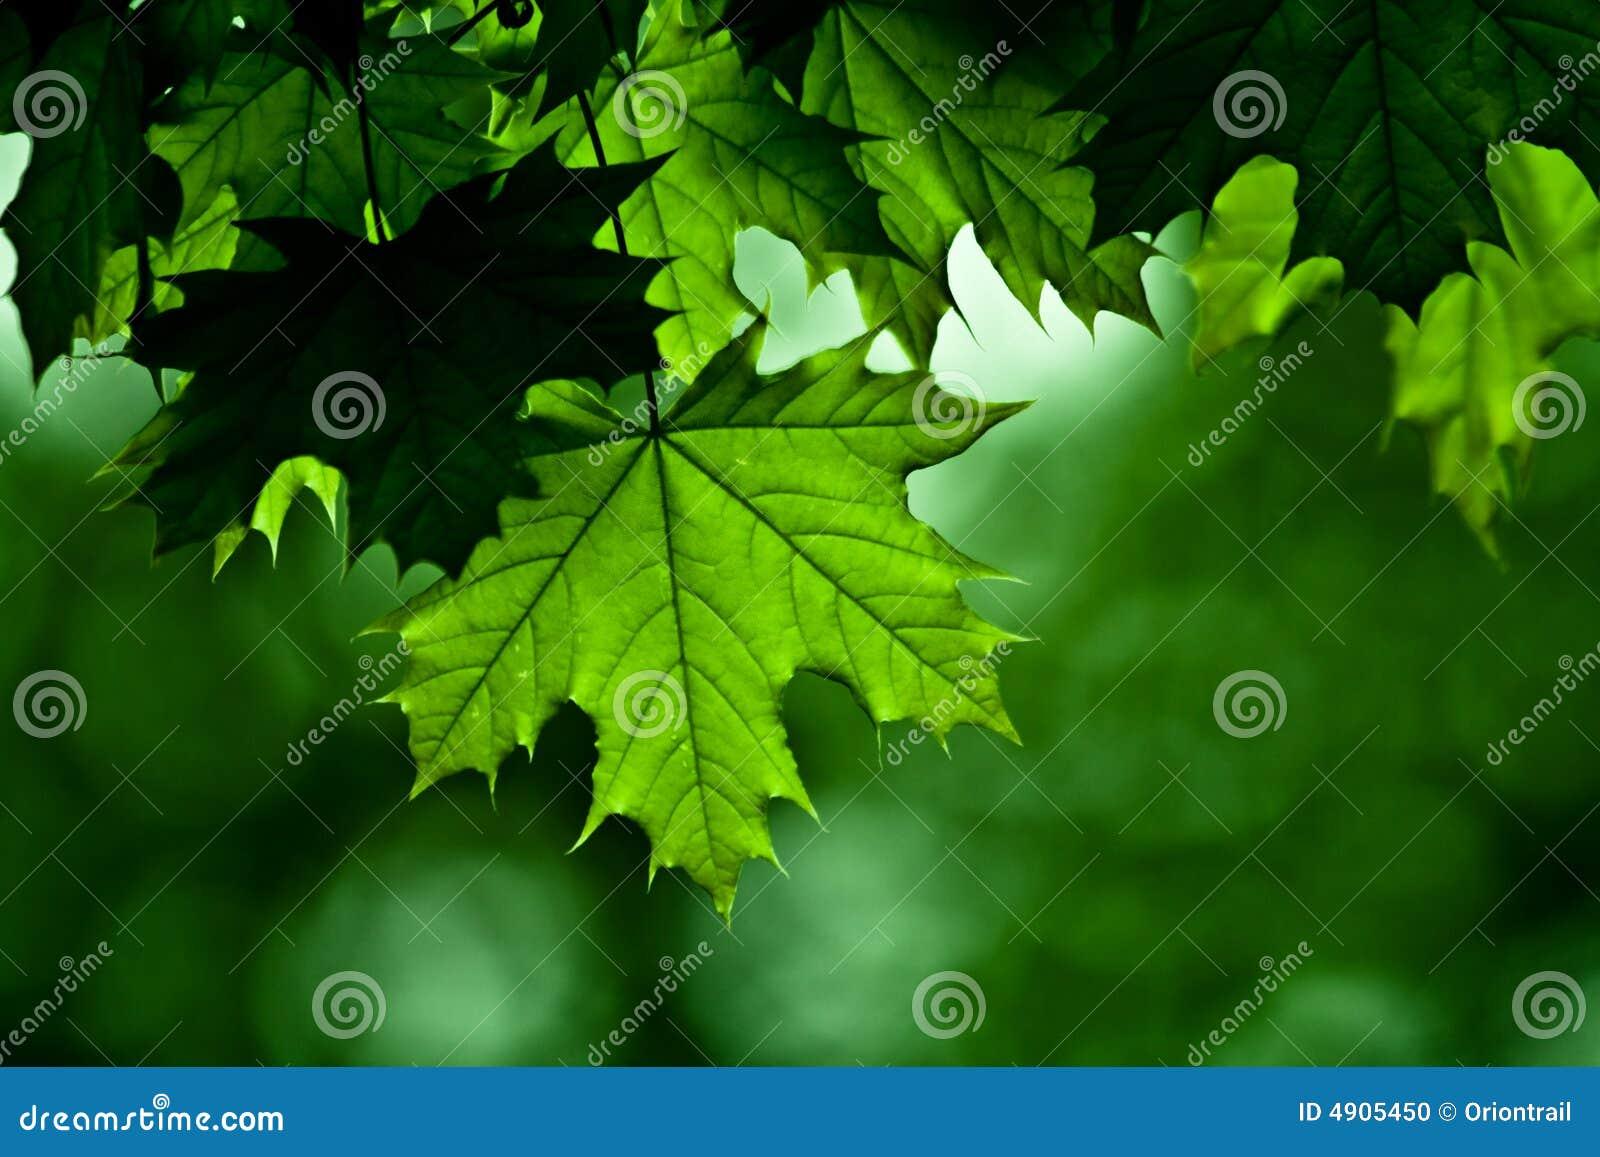 Maple tree detail